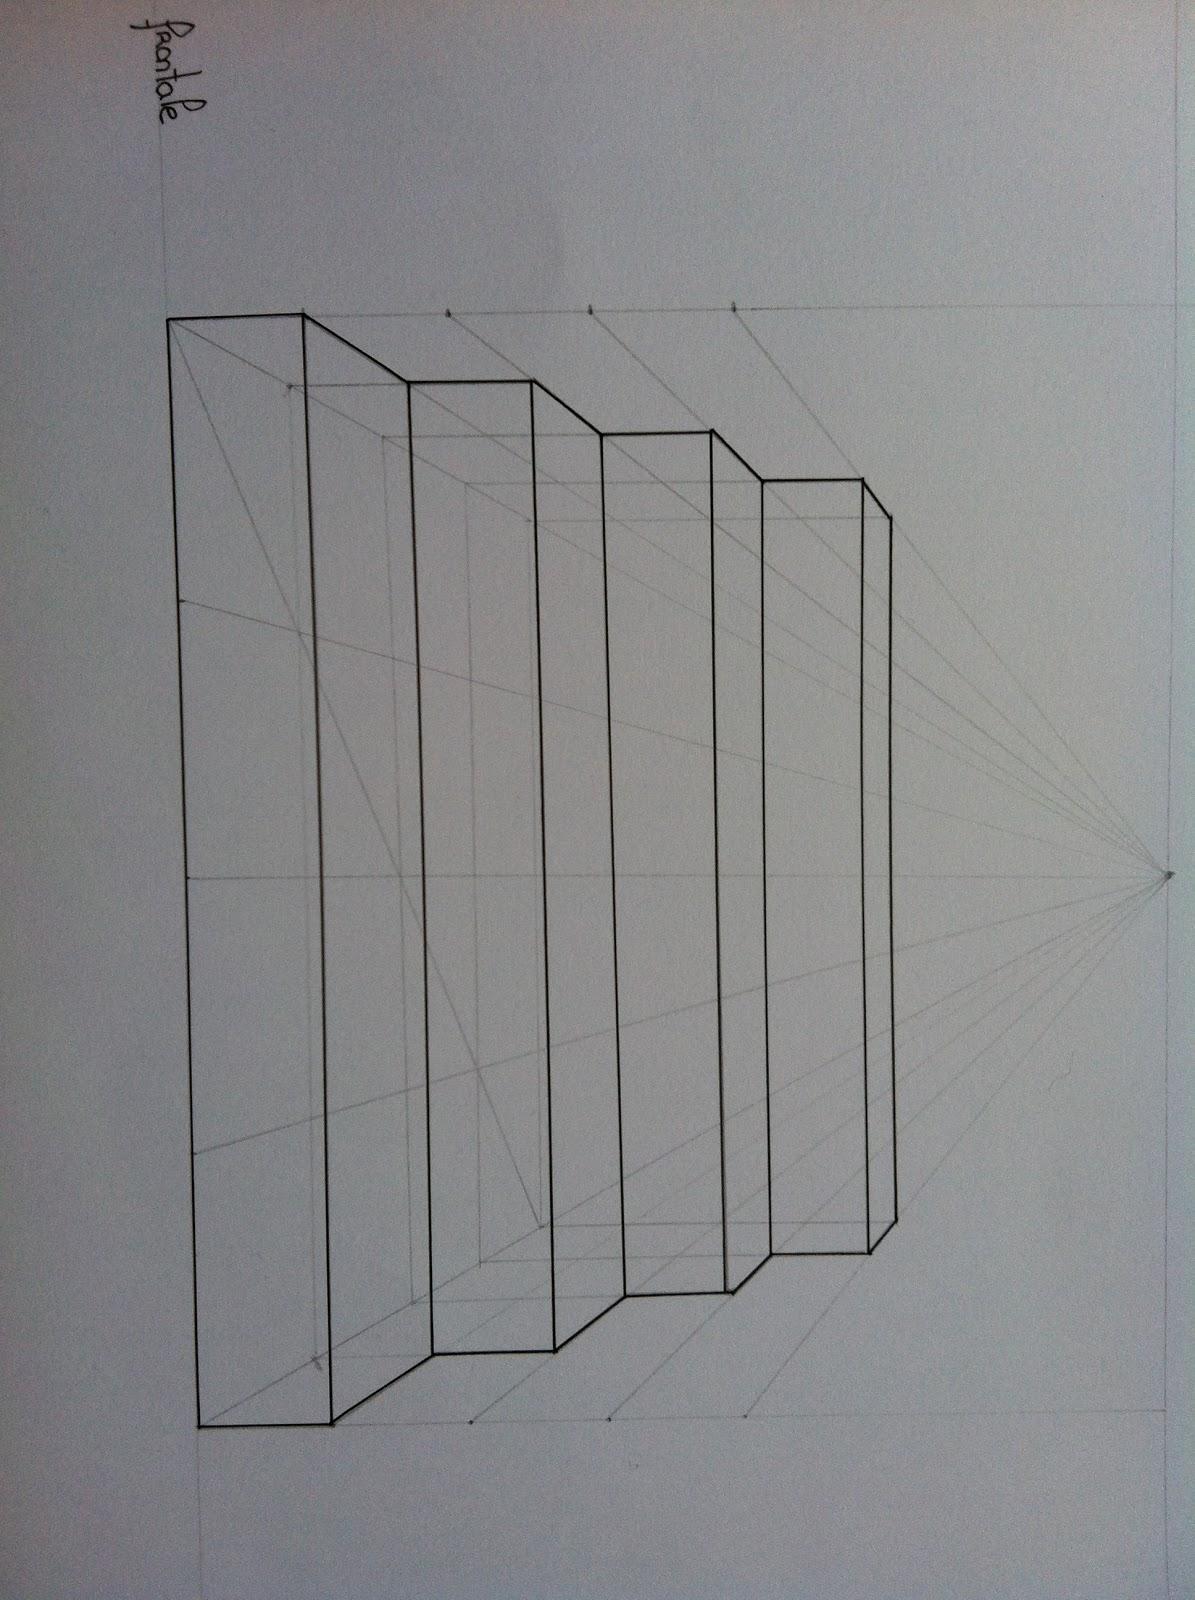 Devoir n°2 : Initiation au dessin en perspective | Ma formation en ...